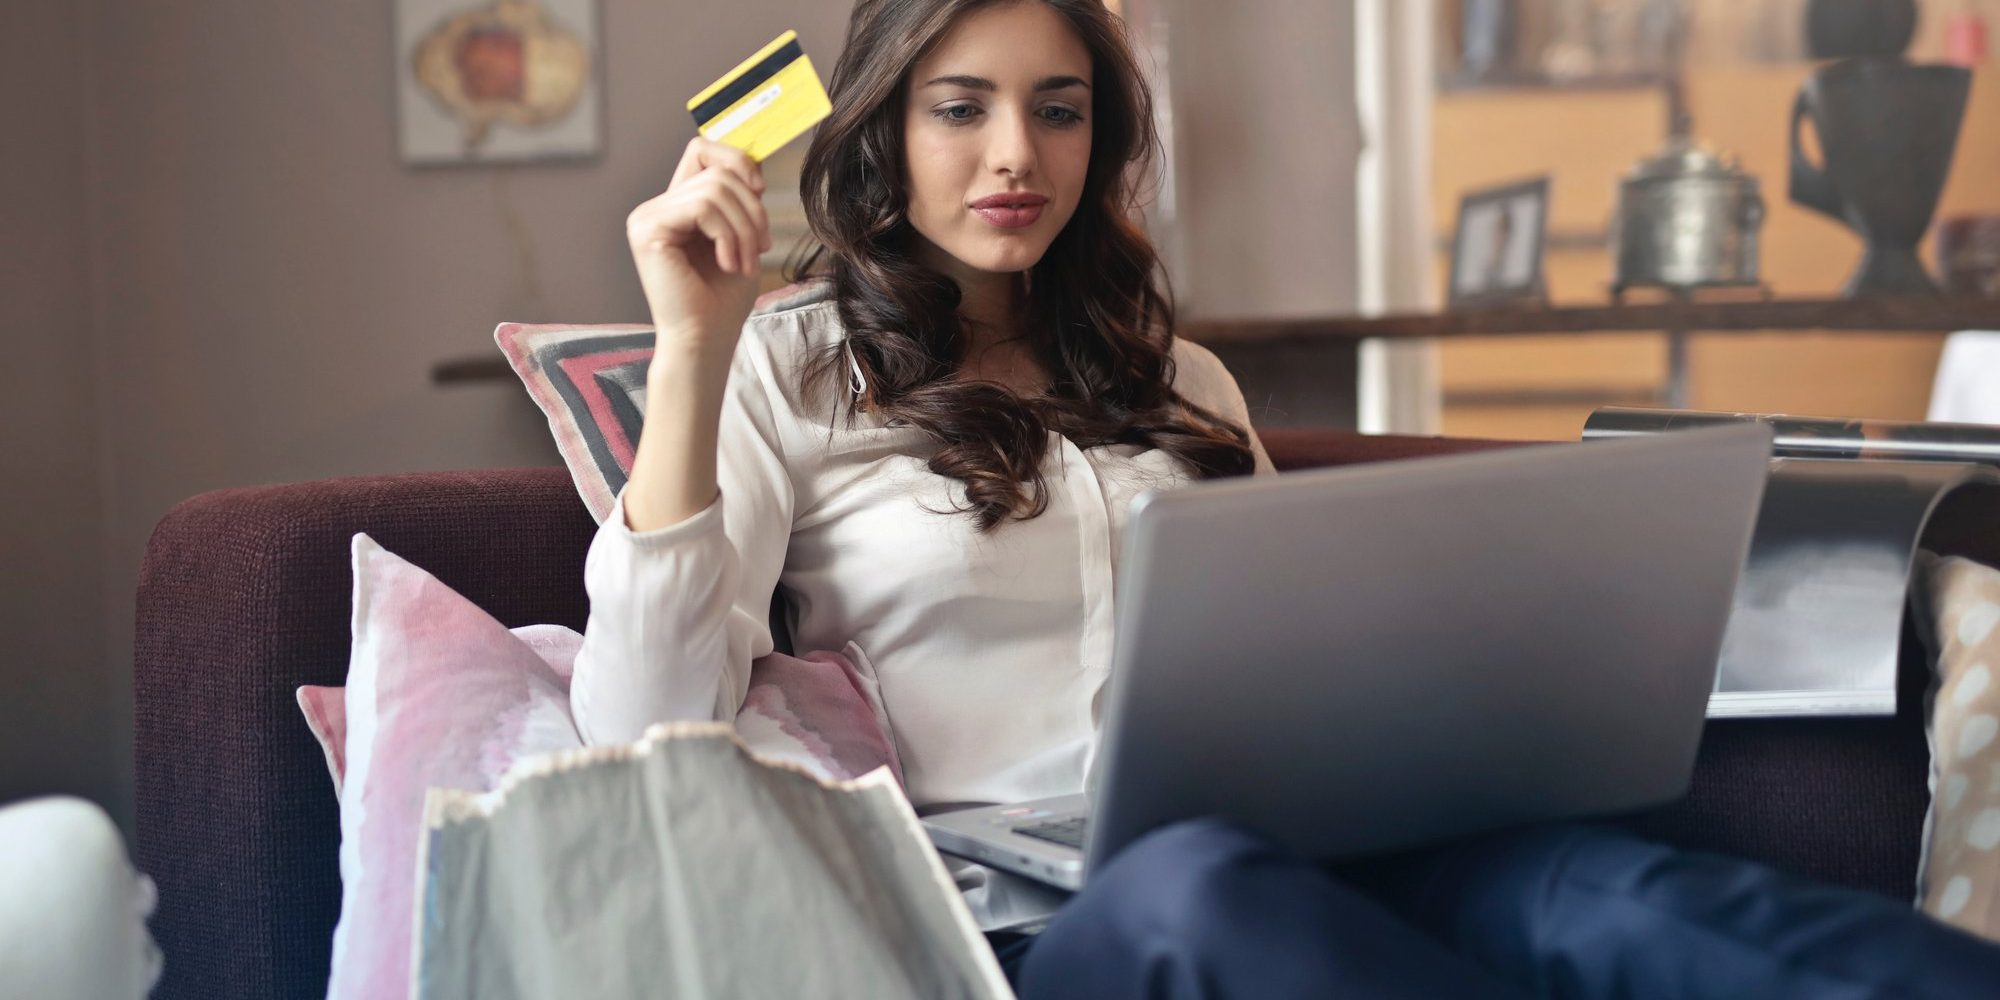 How to Acquire an E-commerce License in Dubai